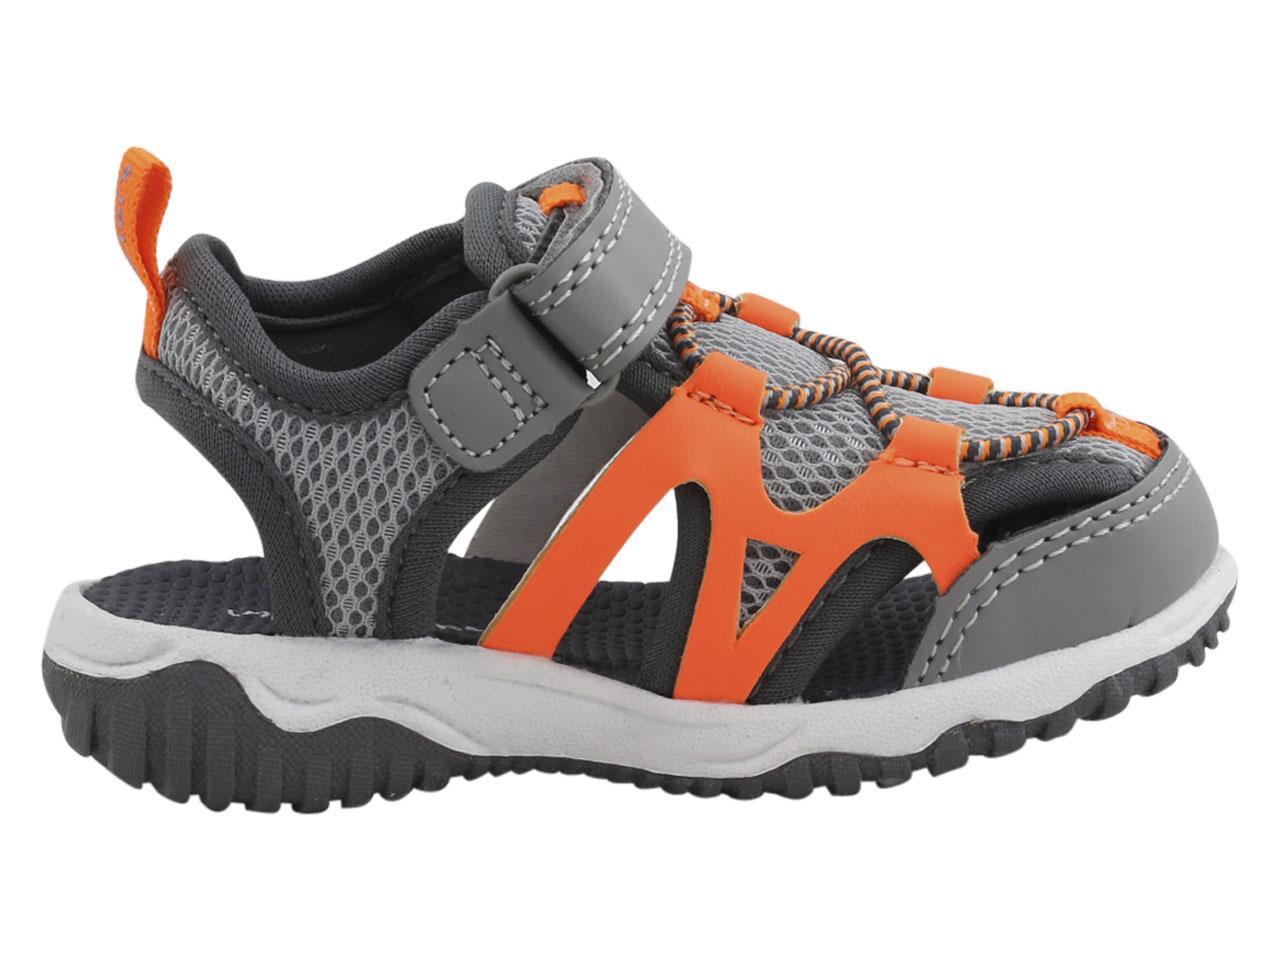 Carter-039-s-Toddler-Boy-039-s-Zyntec-B-Sandals-Shoes thumbnail 17